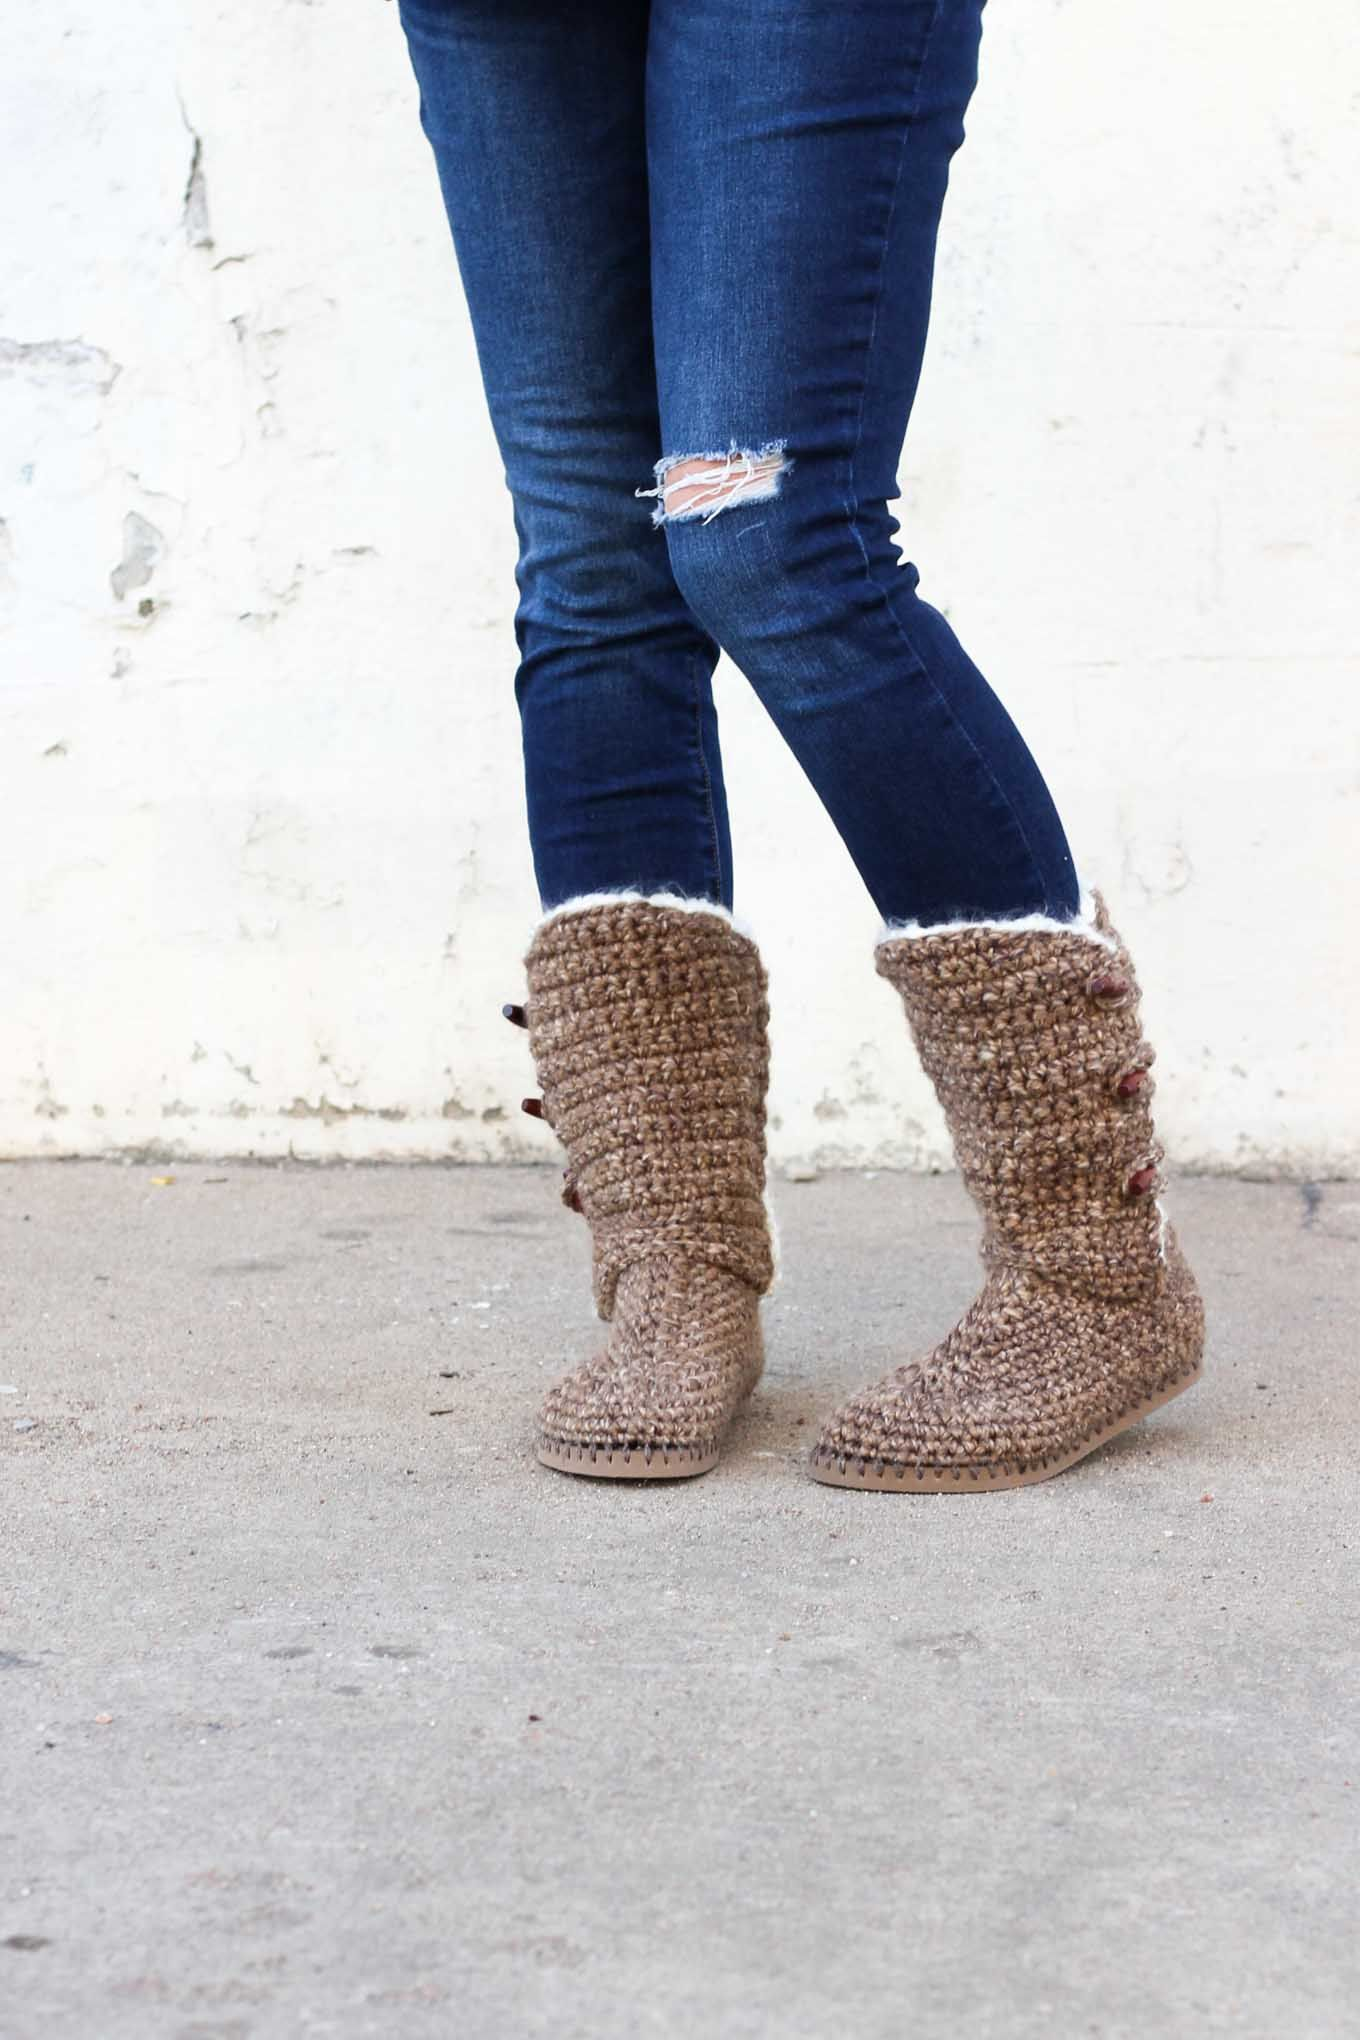 Crochet Boots With Flip Flop Soles - Free Pattern + Video | Crochet ...